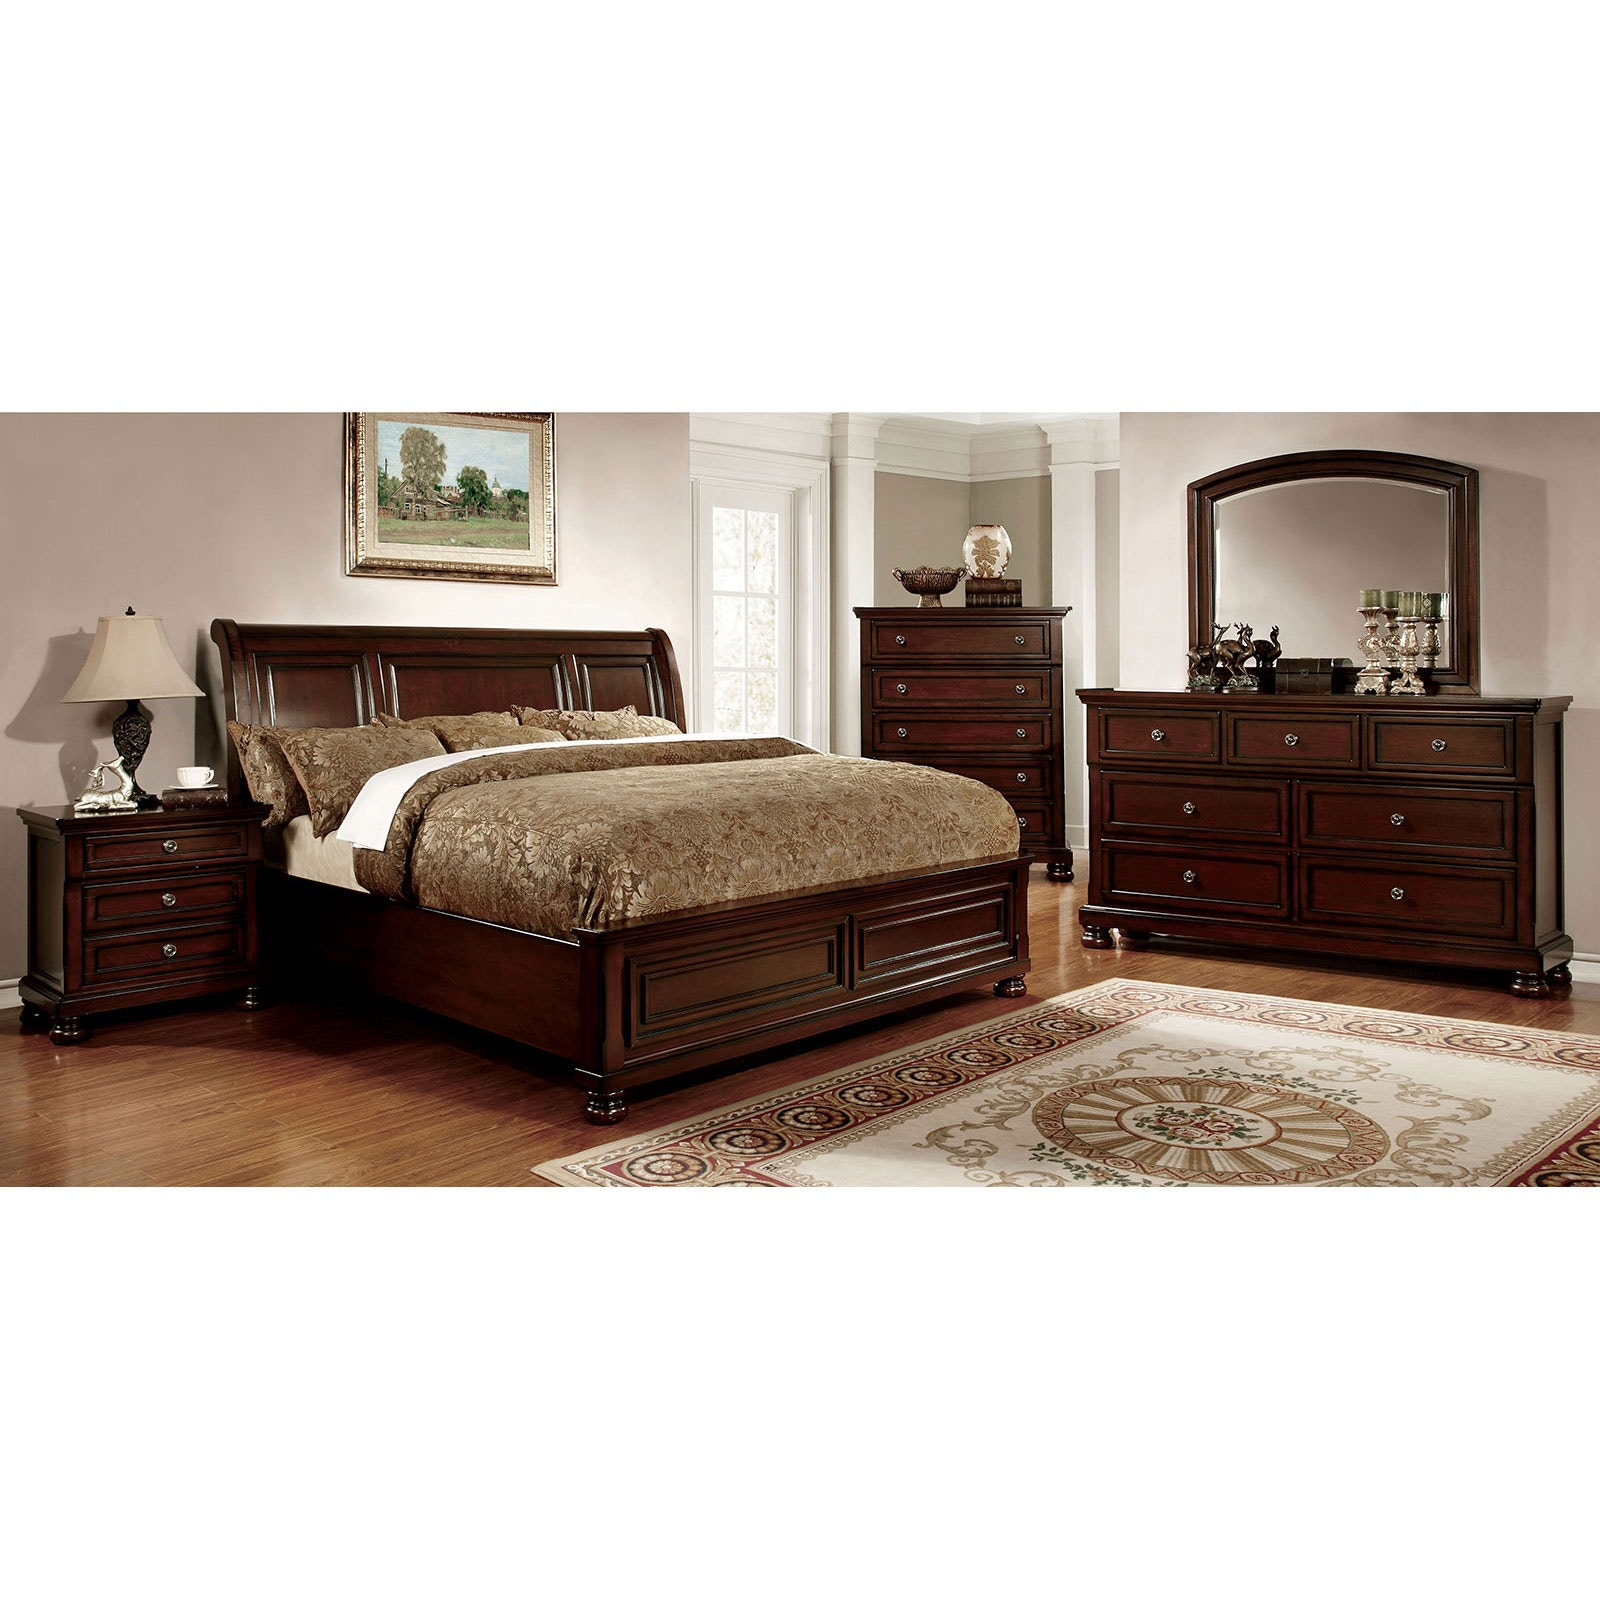 Furniture Of America Night Stand CM7682N